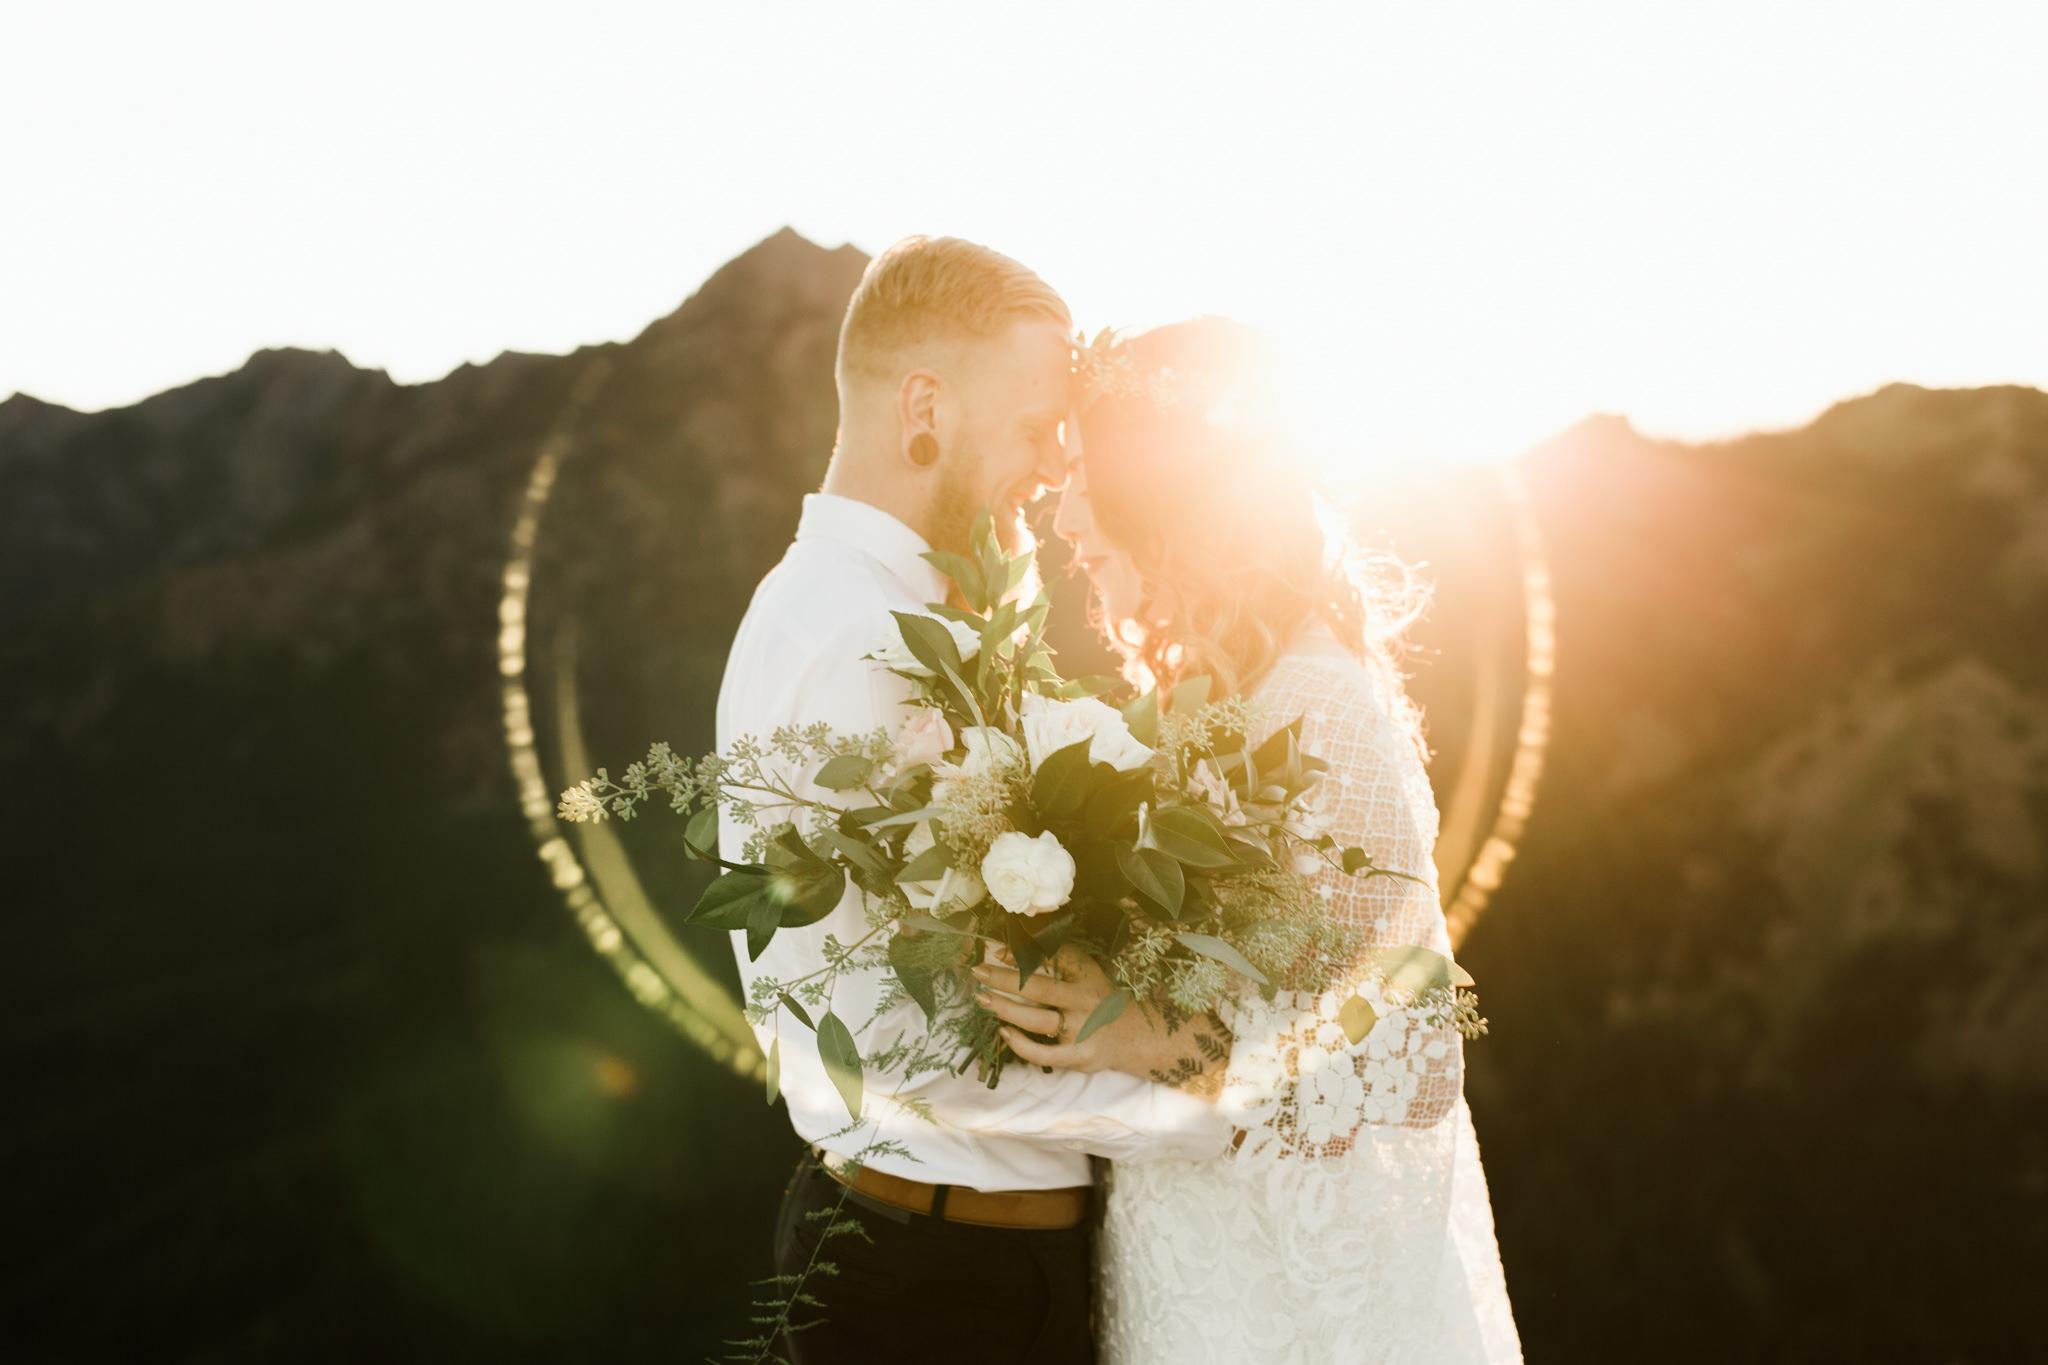 Jesse-Kasie-Hurricane-Ridge-Wedding-37.jpg